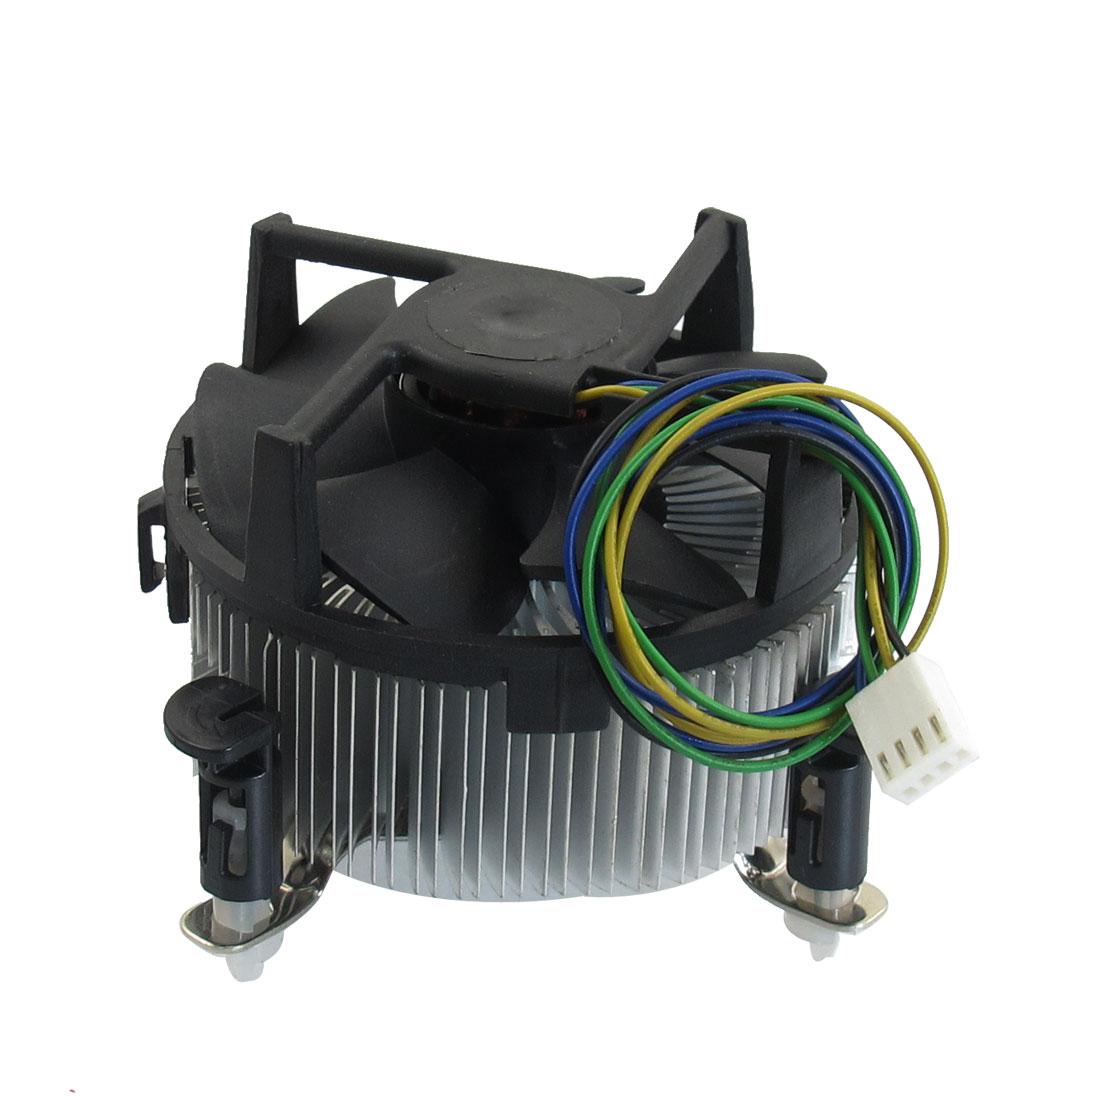 12V DC 0.6A Black Silver Tone Round Shaped Couputer CPU Cooler Fan